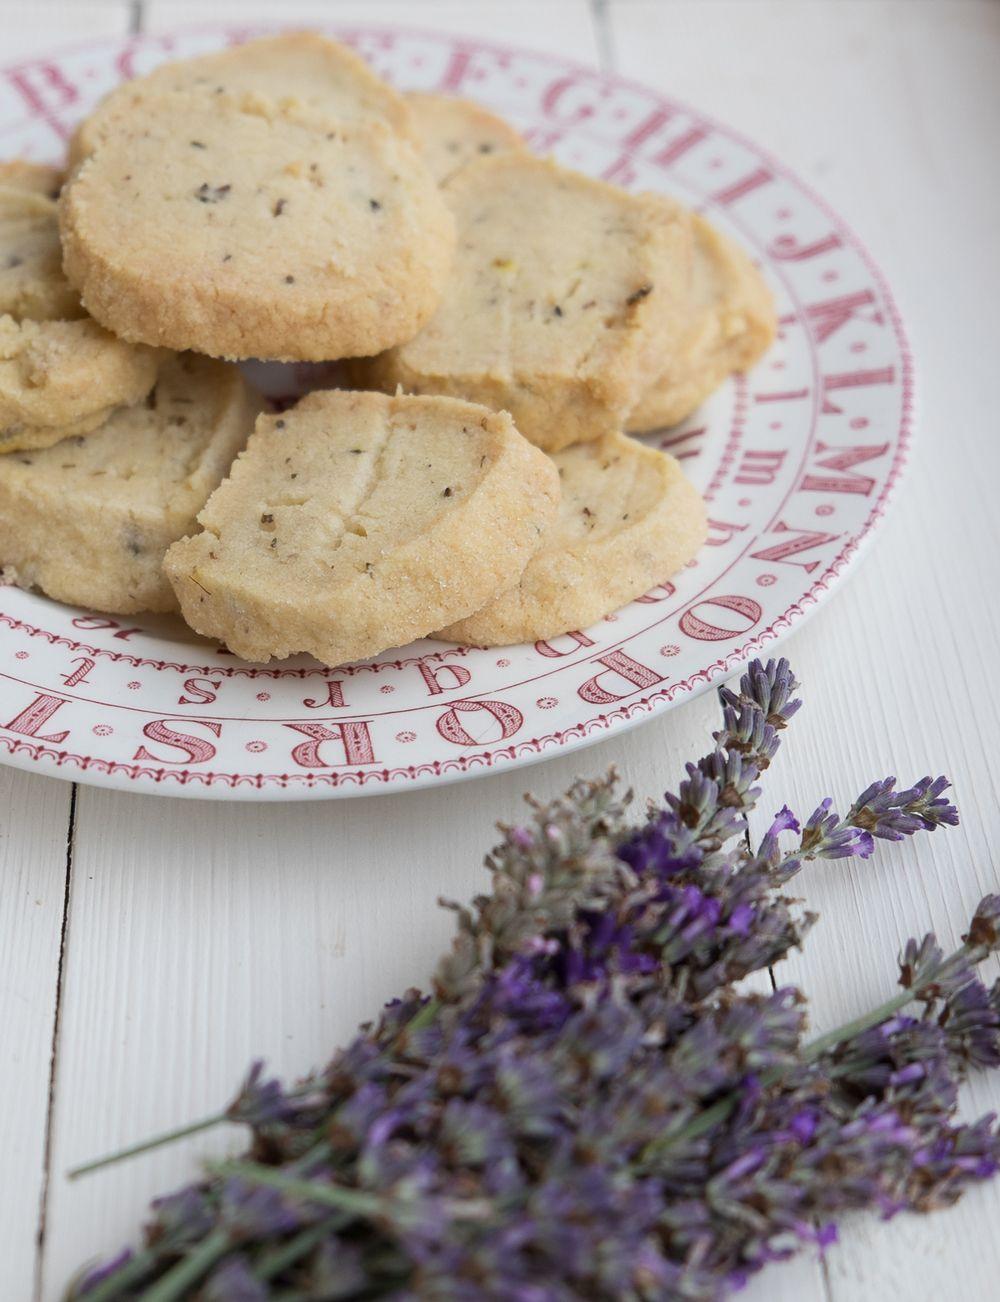 Mary berrys lavender shortbread recipe made quick easy cookies mary berrys lavender shortbread recipe made quick easy forumfinder Choice Image